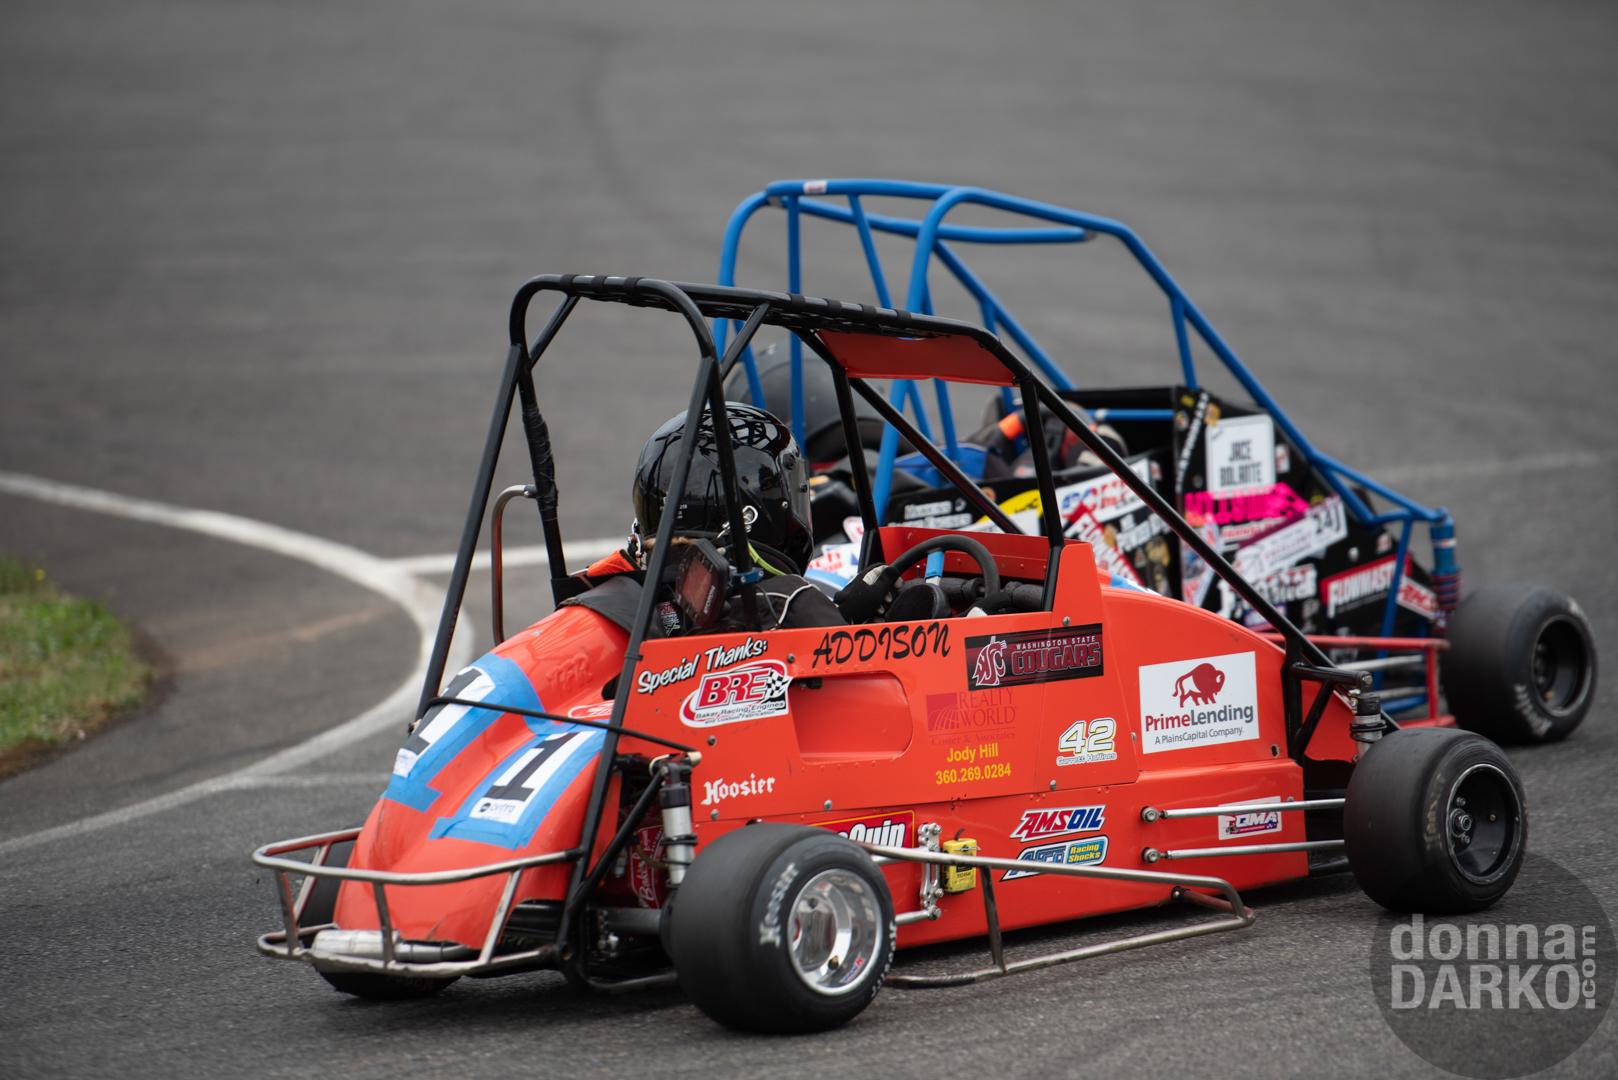 QWMA (Racing) 8-11-2019 DSC_6094.jpg